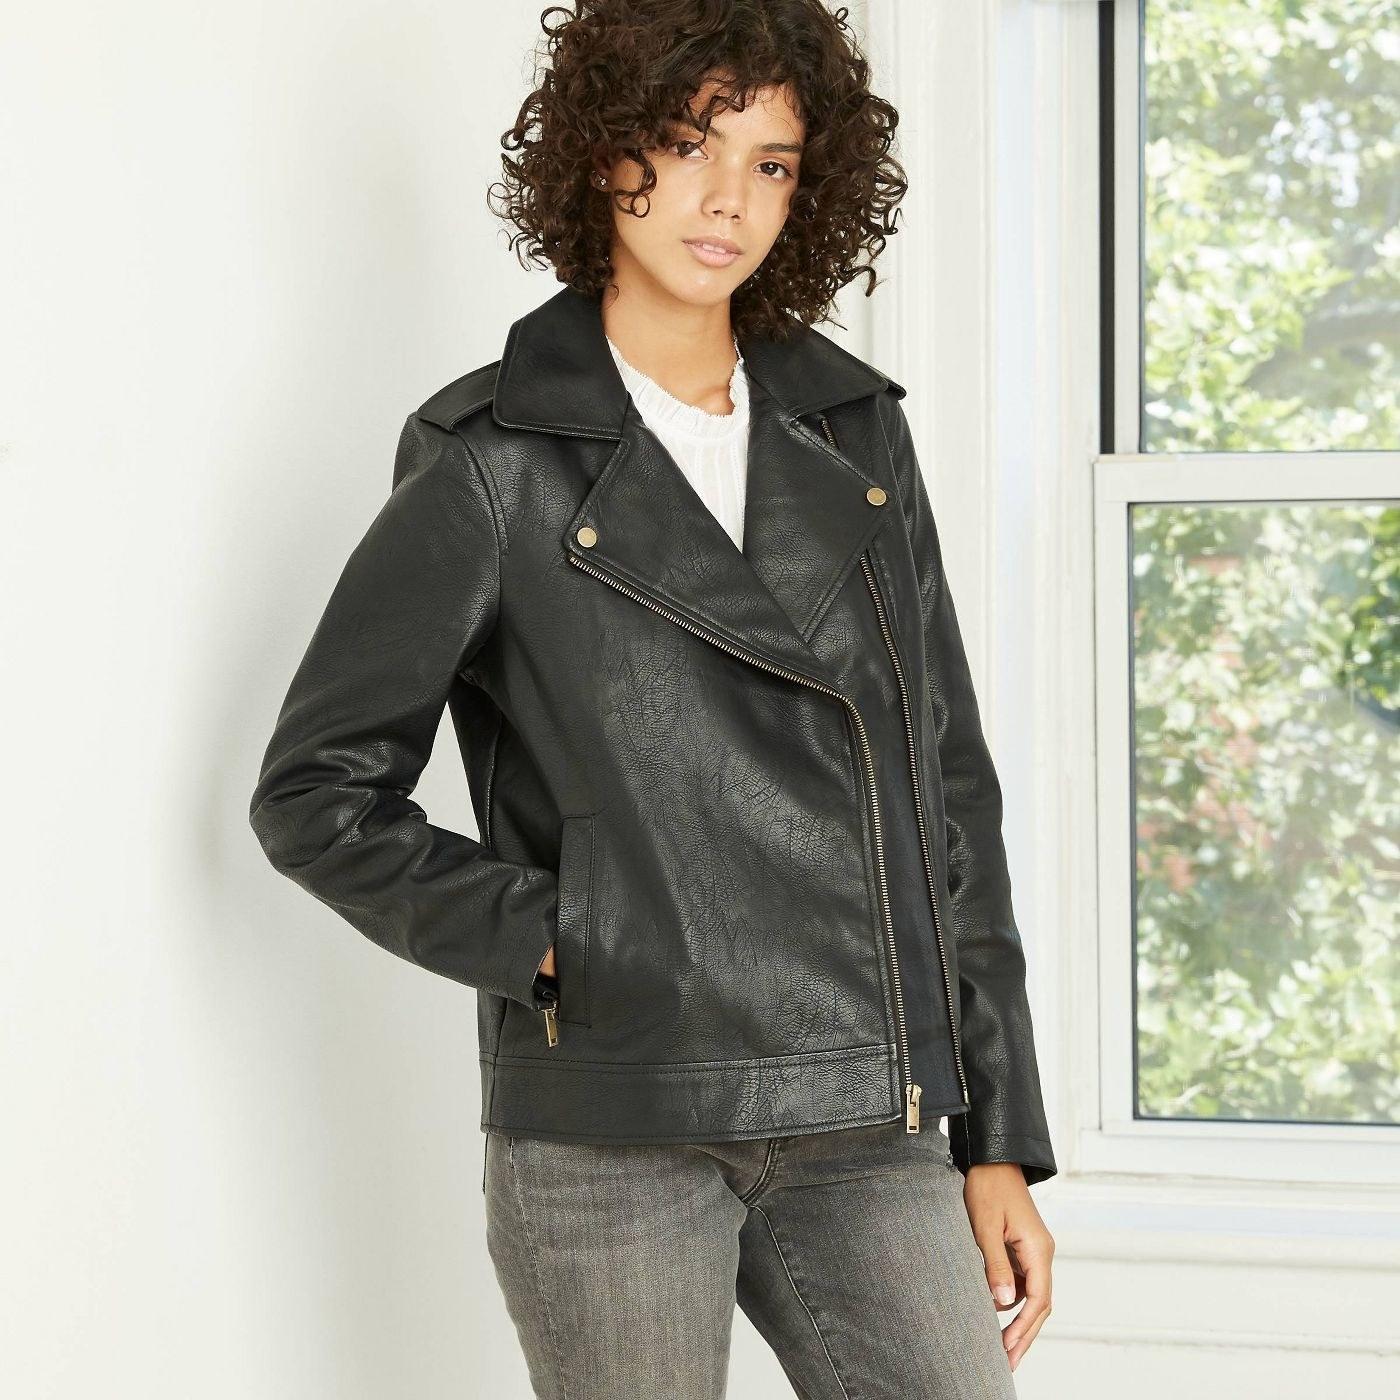 Model wearing black leather jacket with side gold zipper